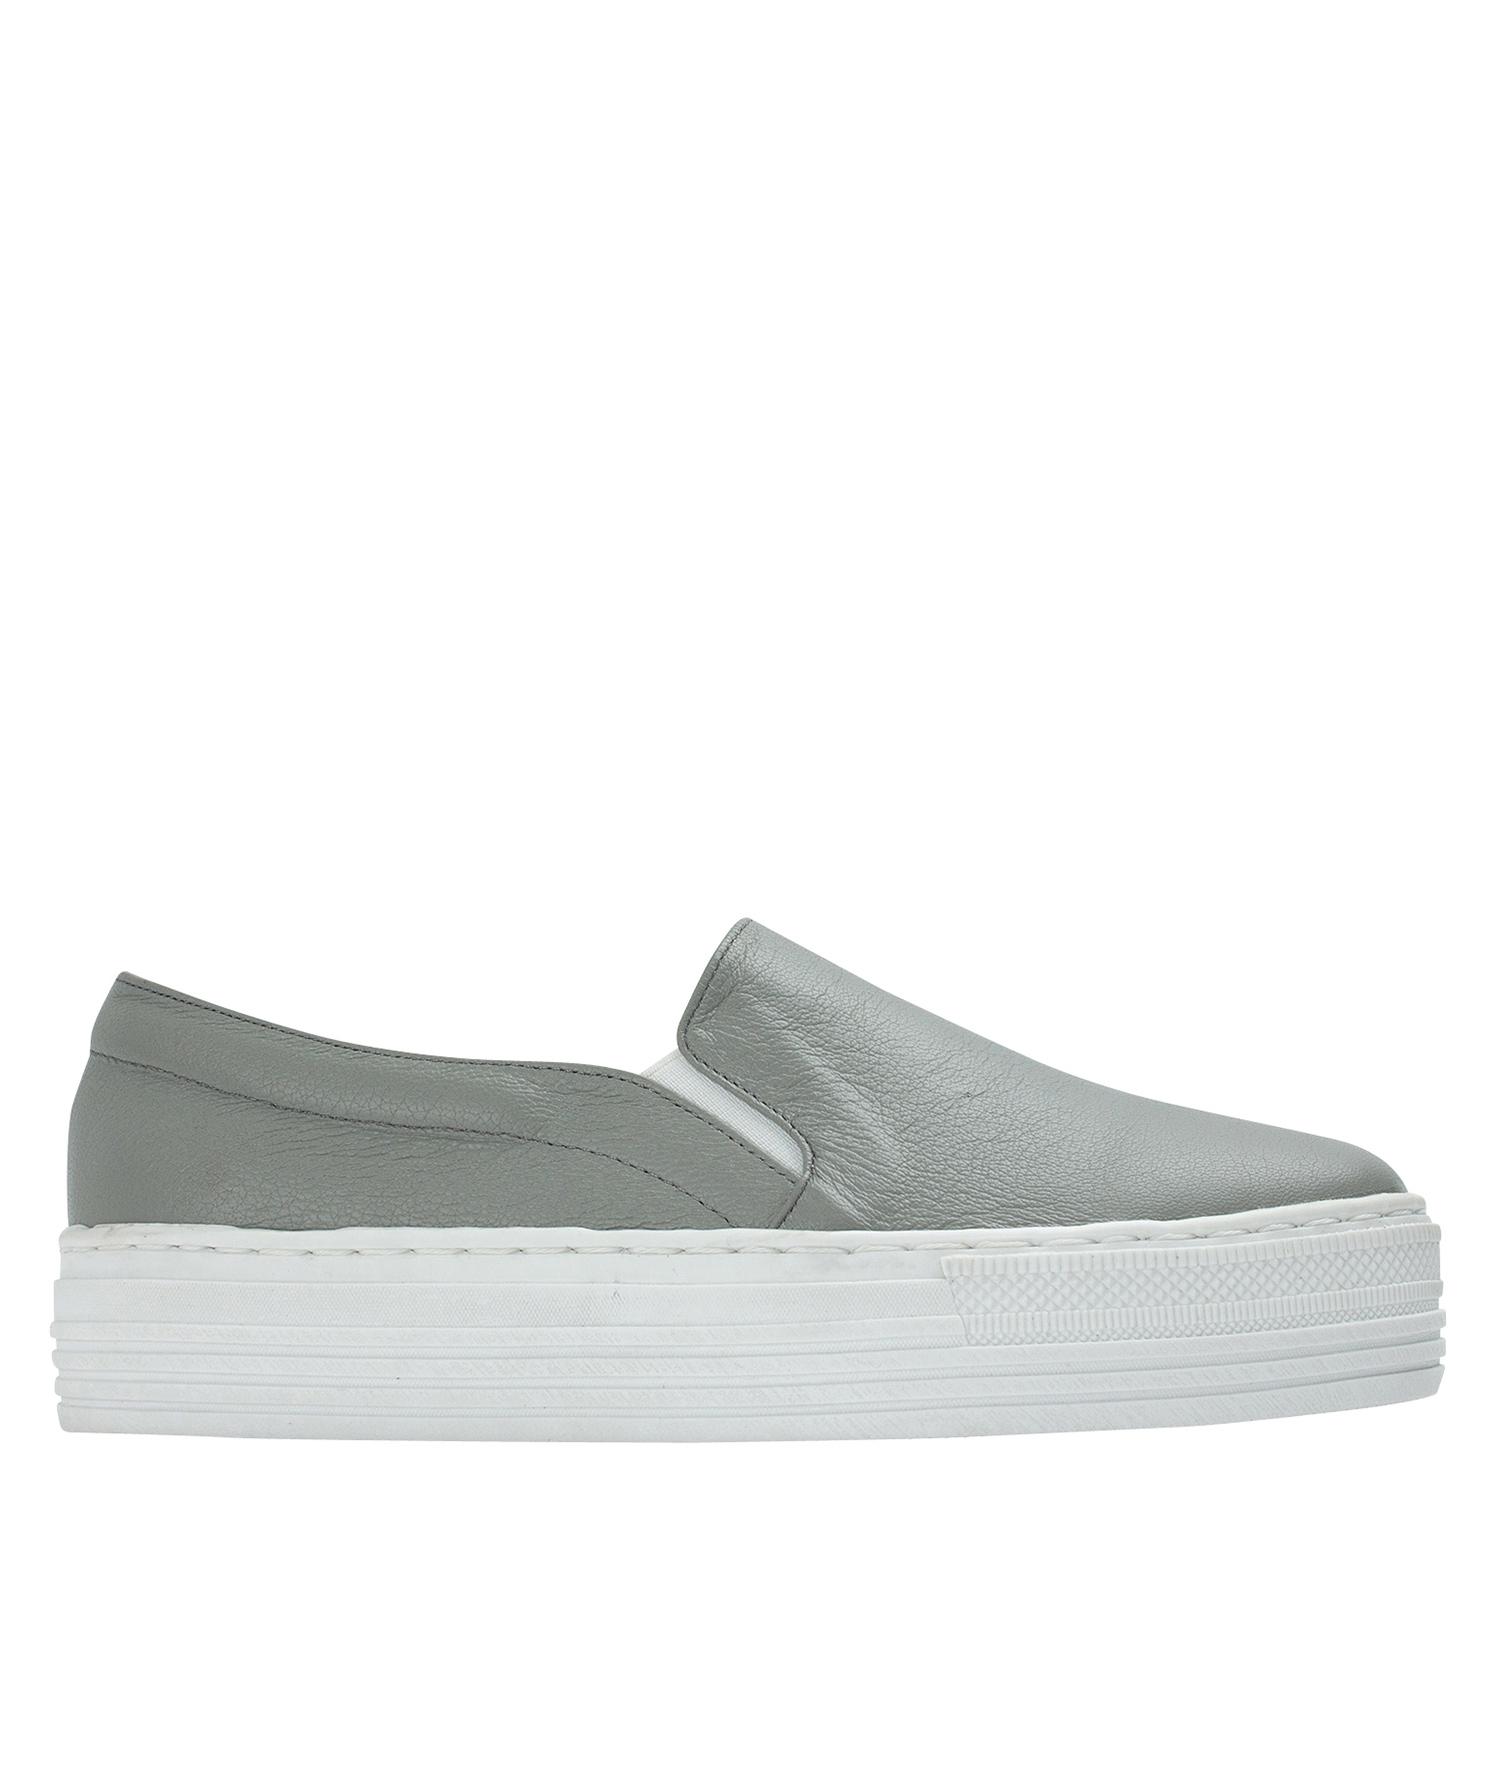 Leather Platform Leather Slip Slip Sneakers Platform On xoWdBeQrC